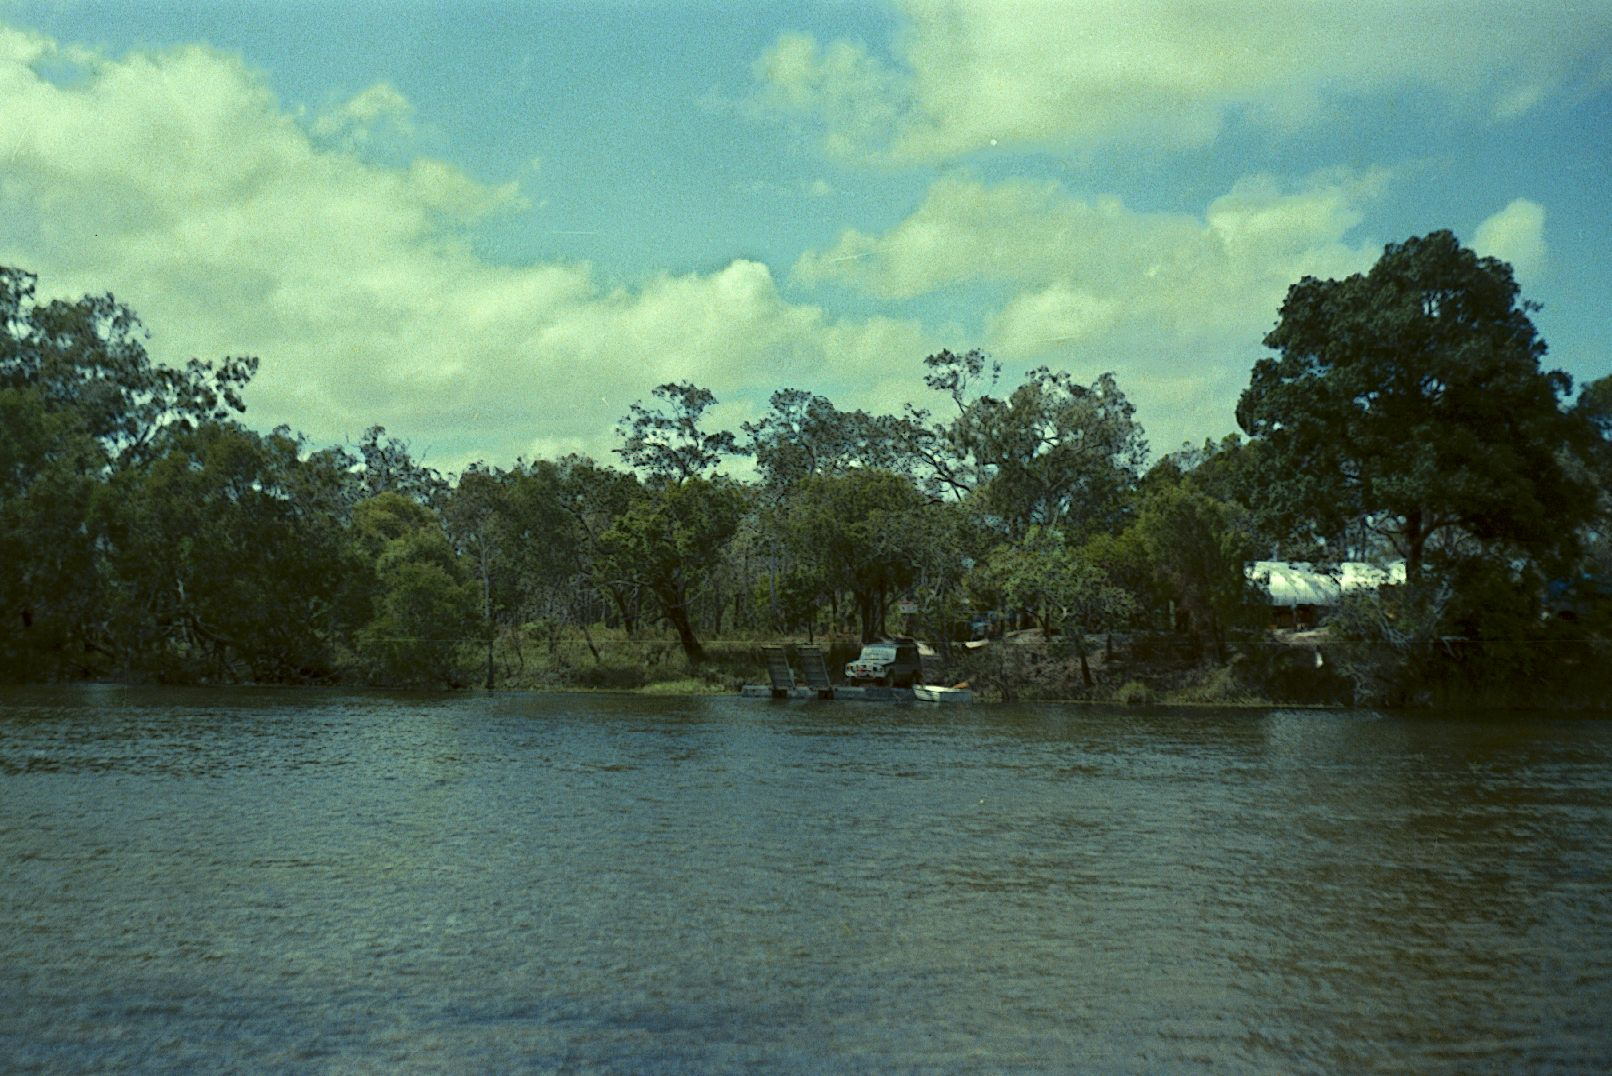 jardine river crossing 1986